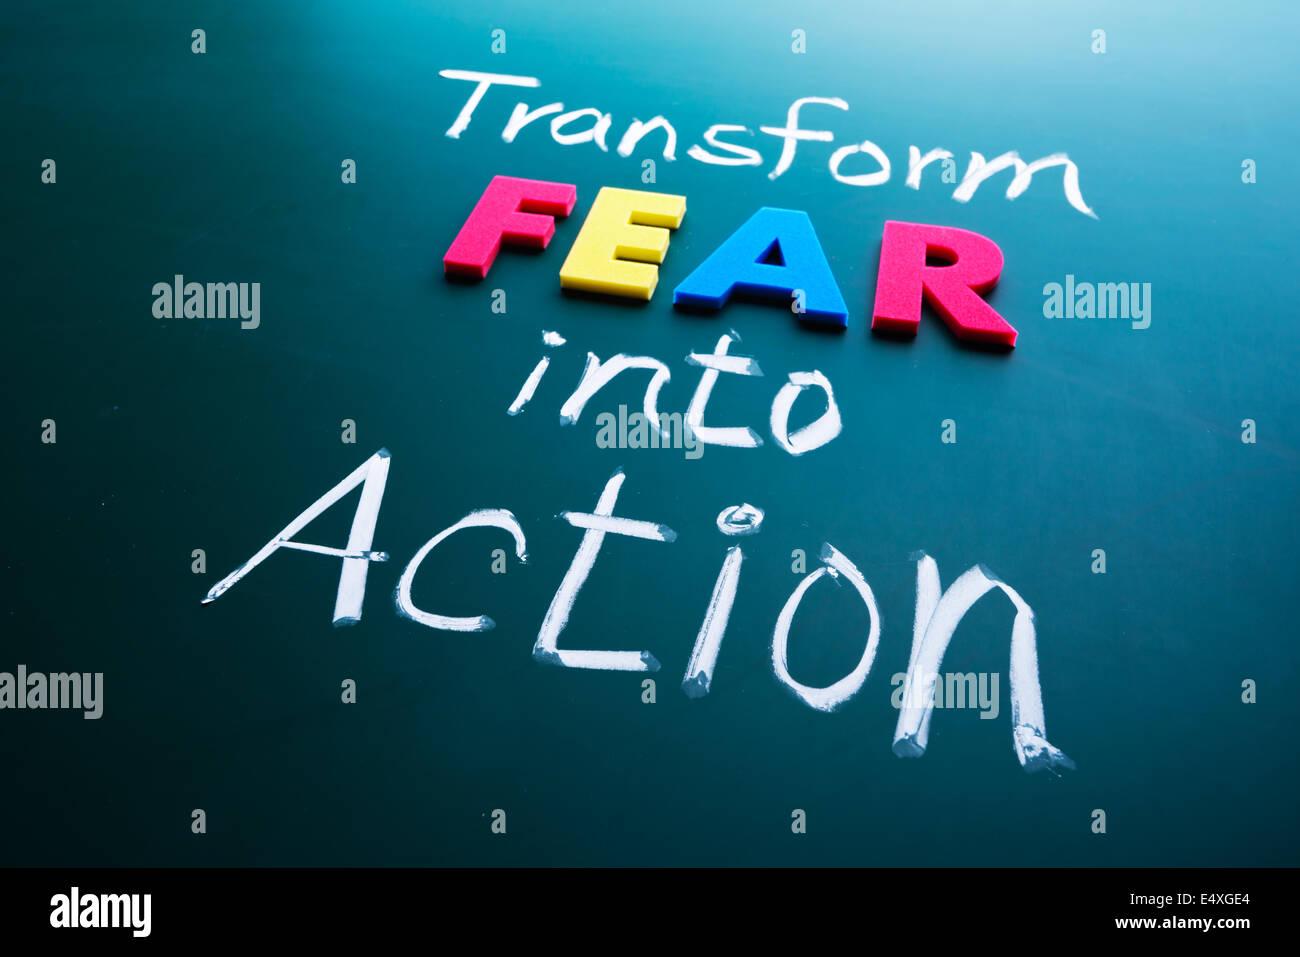 Transform fear into action concept - Stock Image